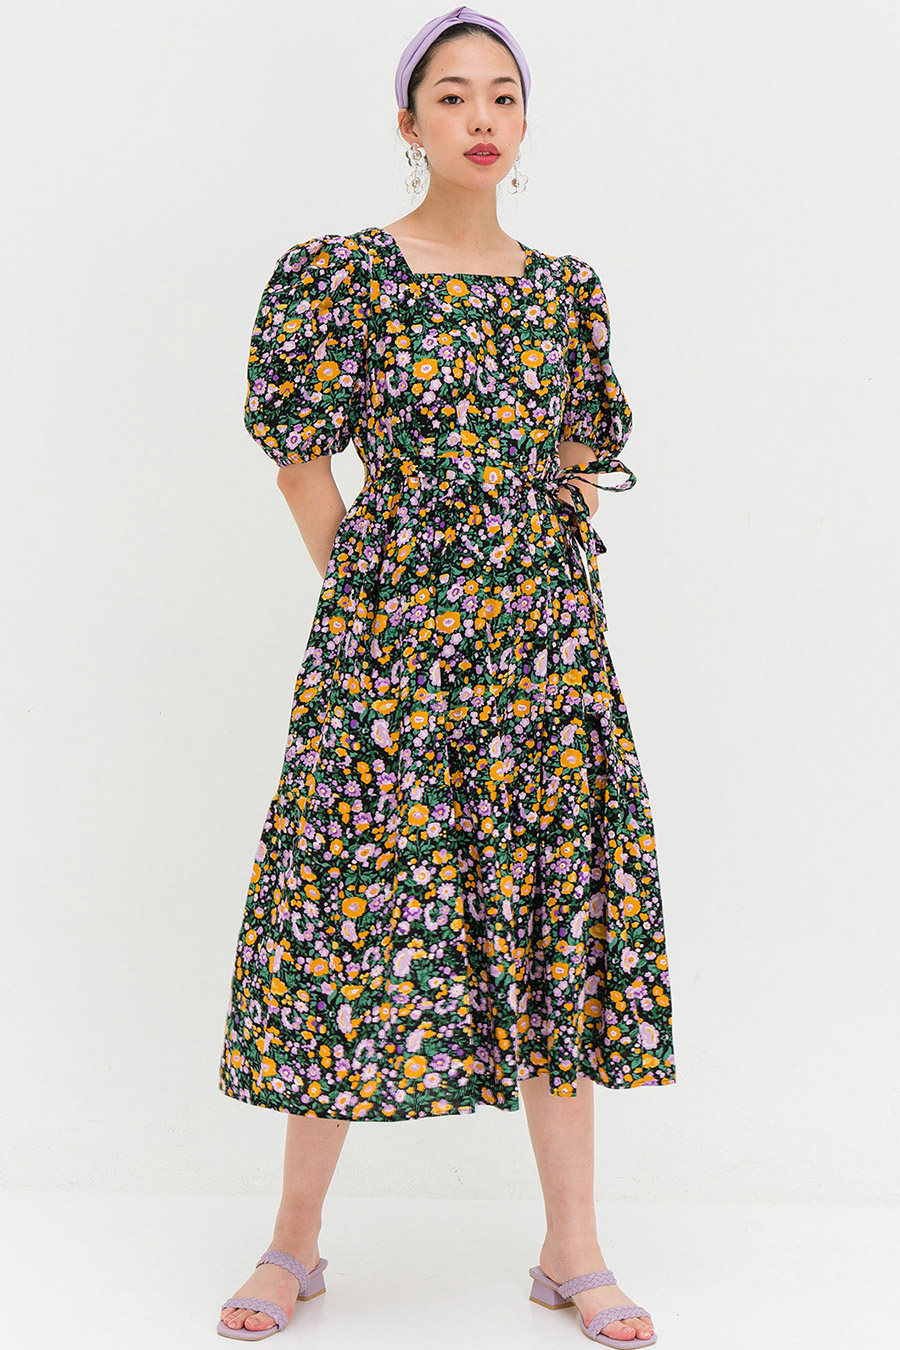 GLADYS DRESS - NOIR FLEUR